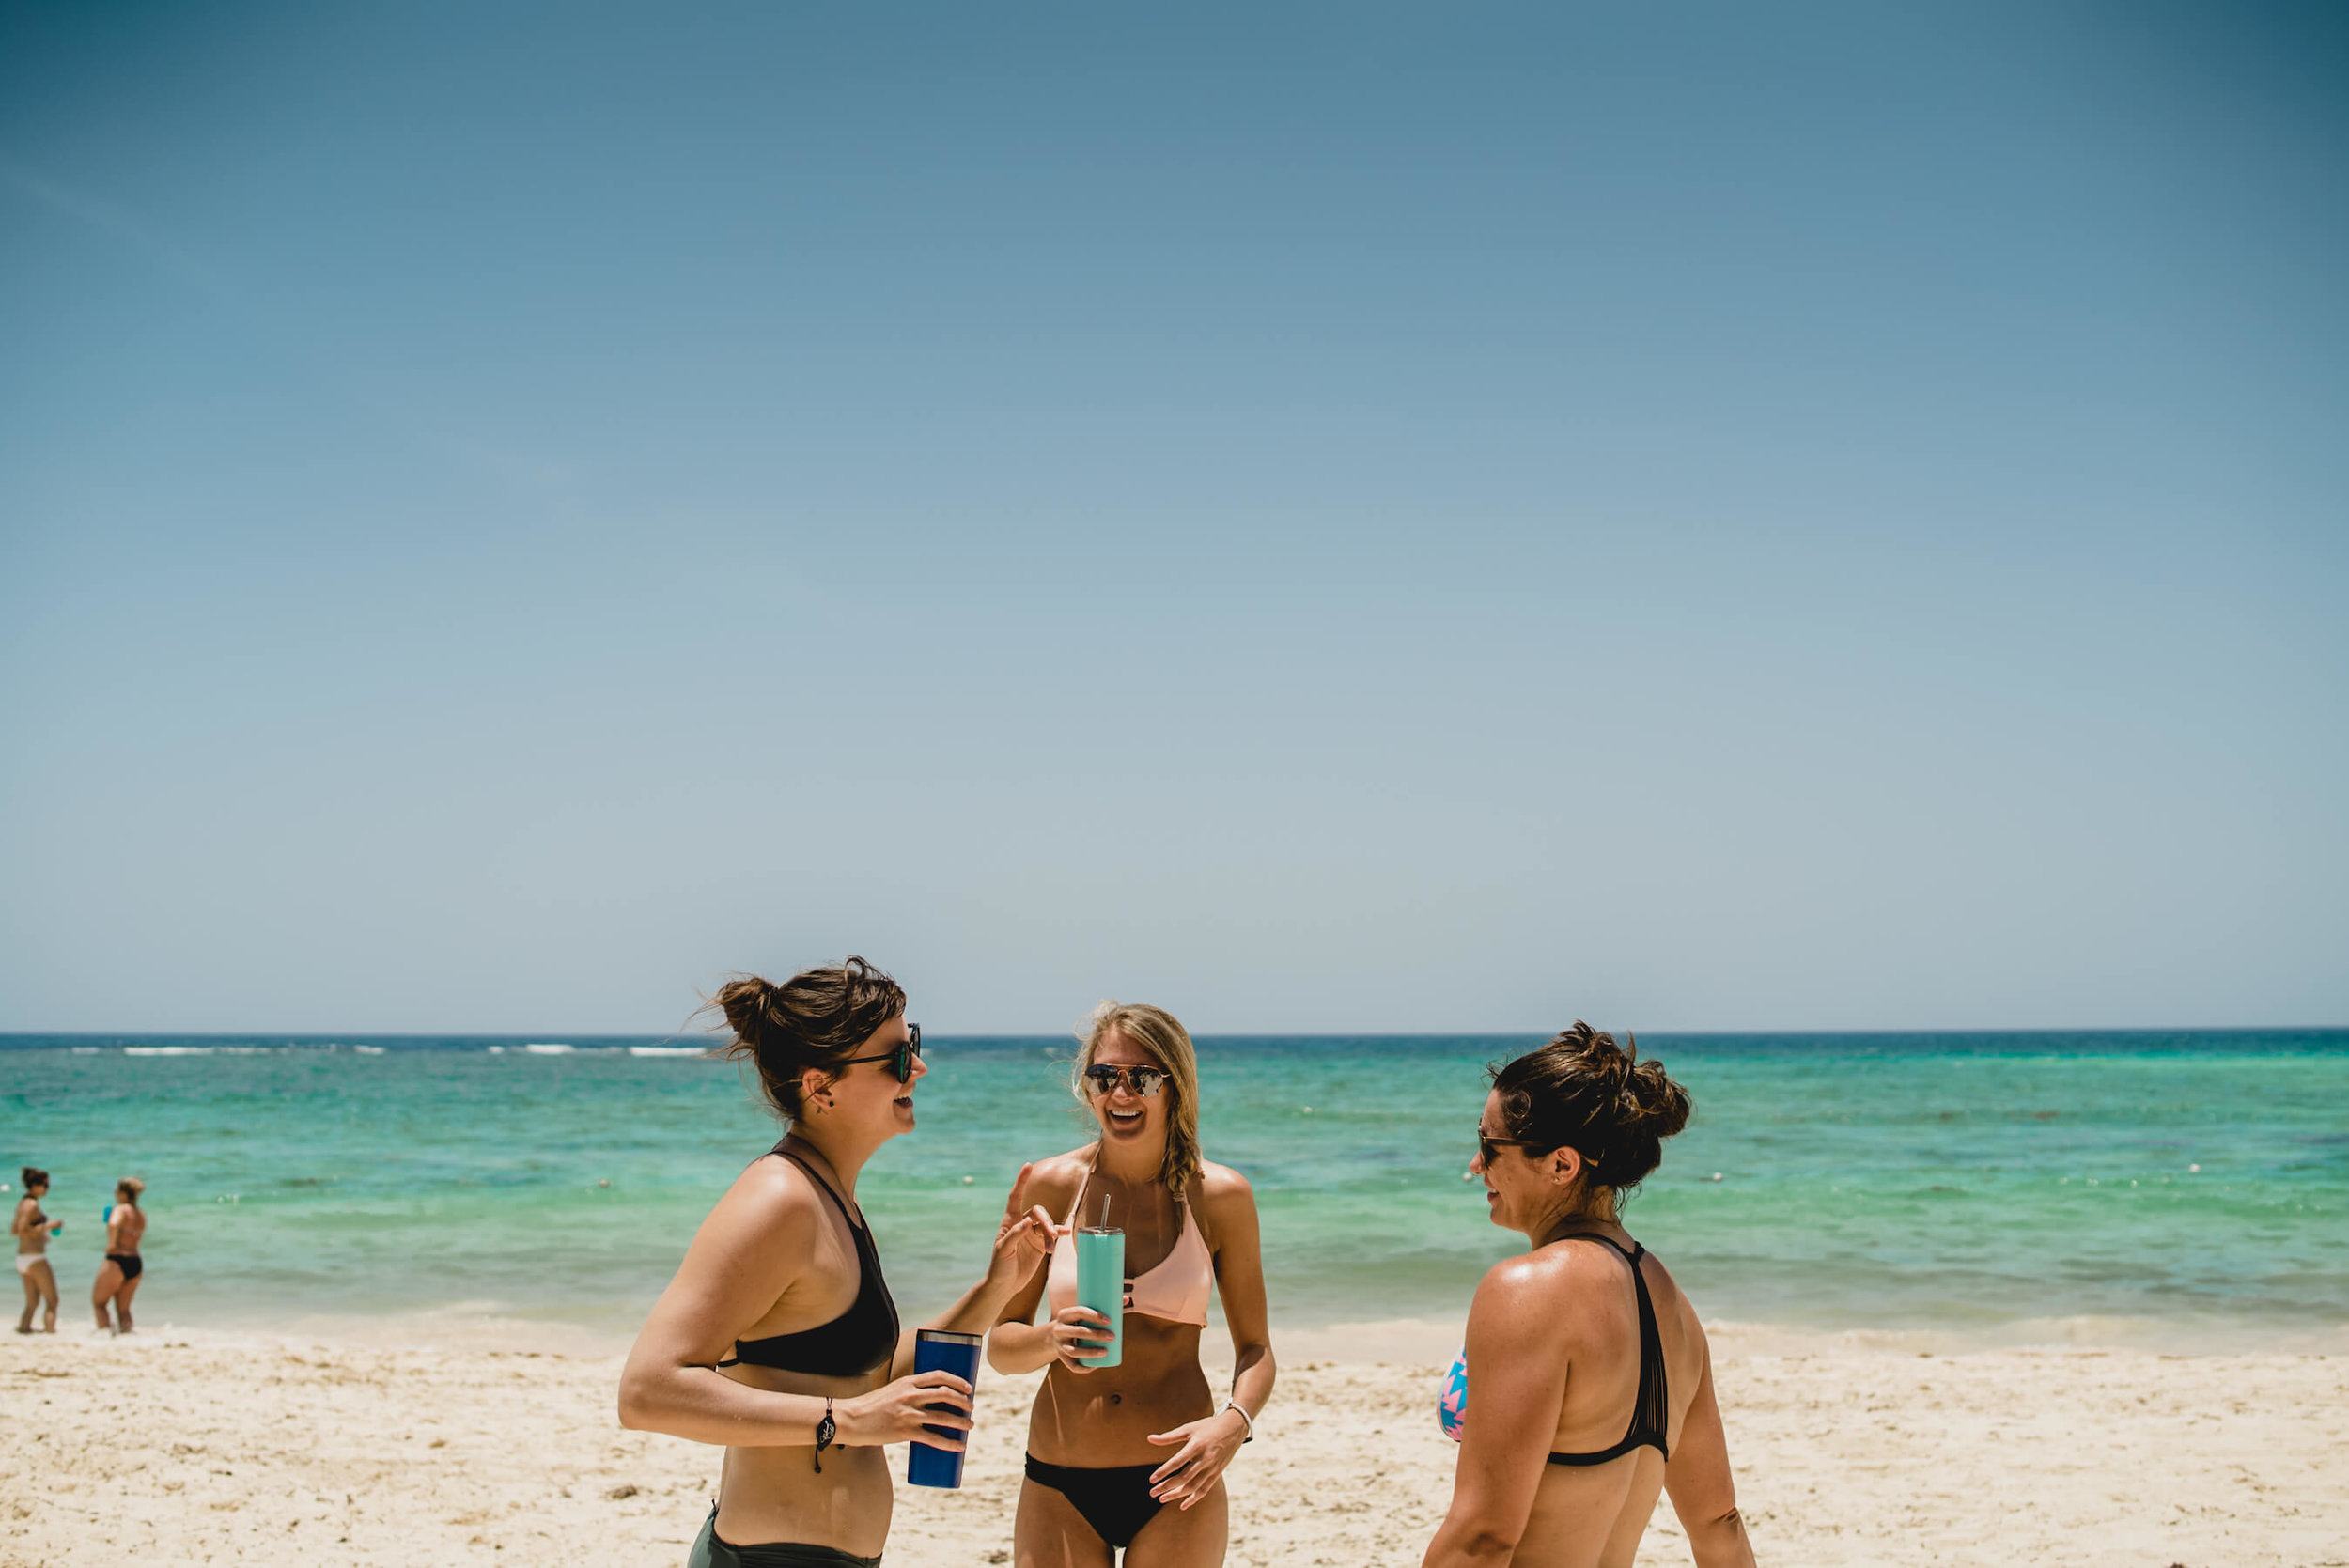 engle-olson-punta-cana-dominican-republic-15.jpg